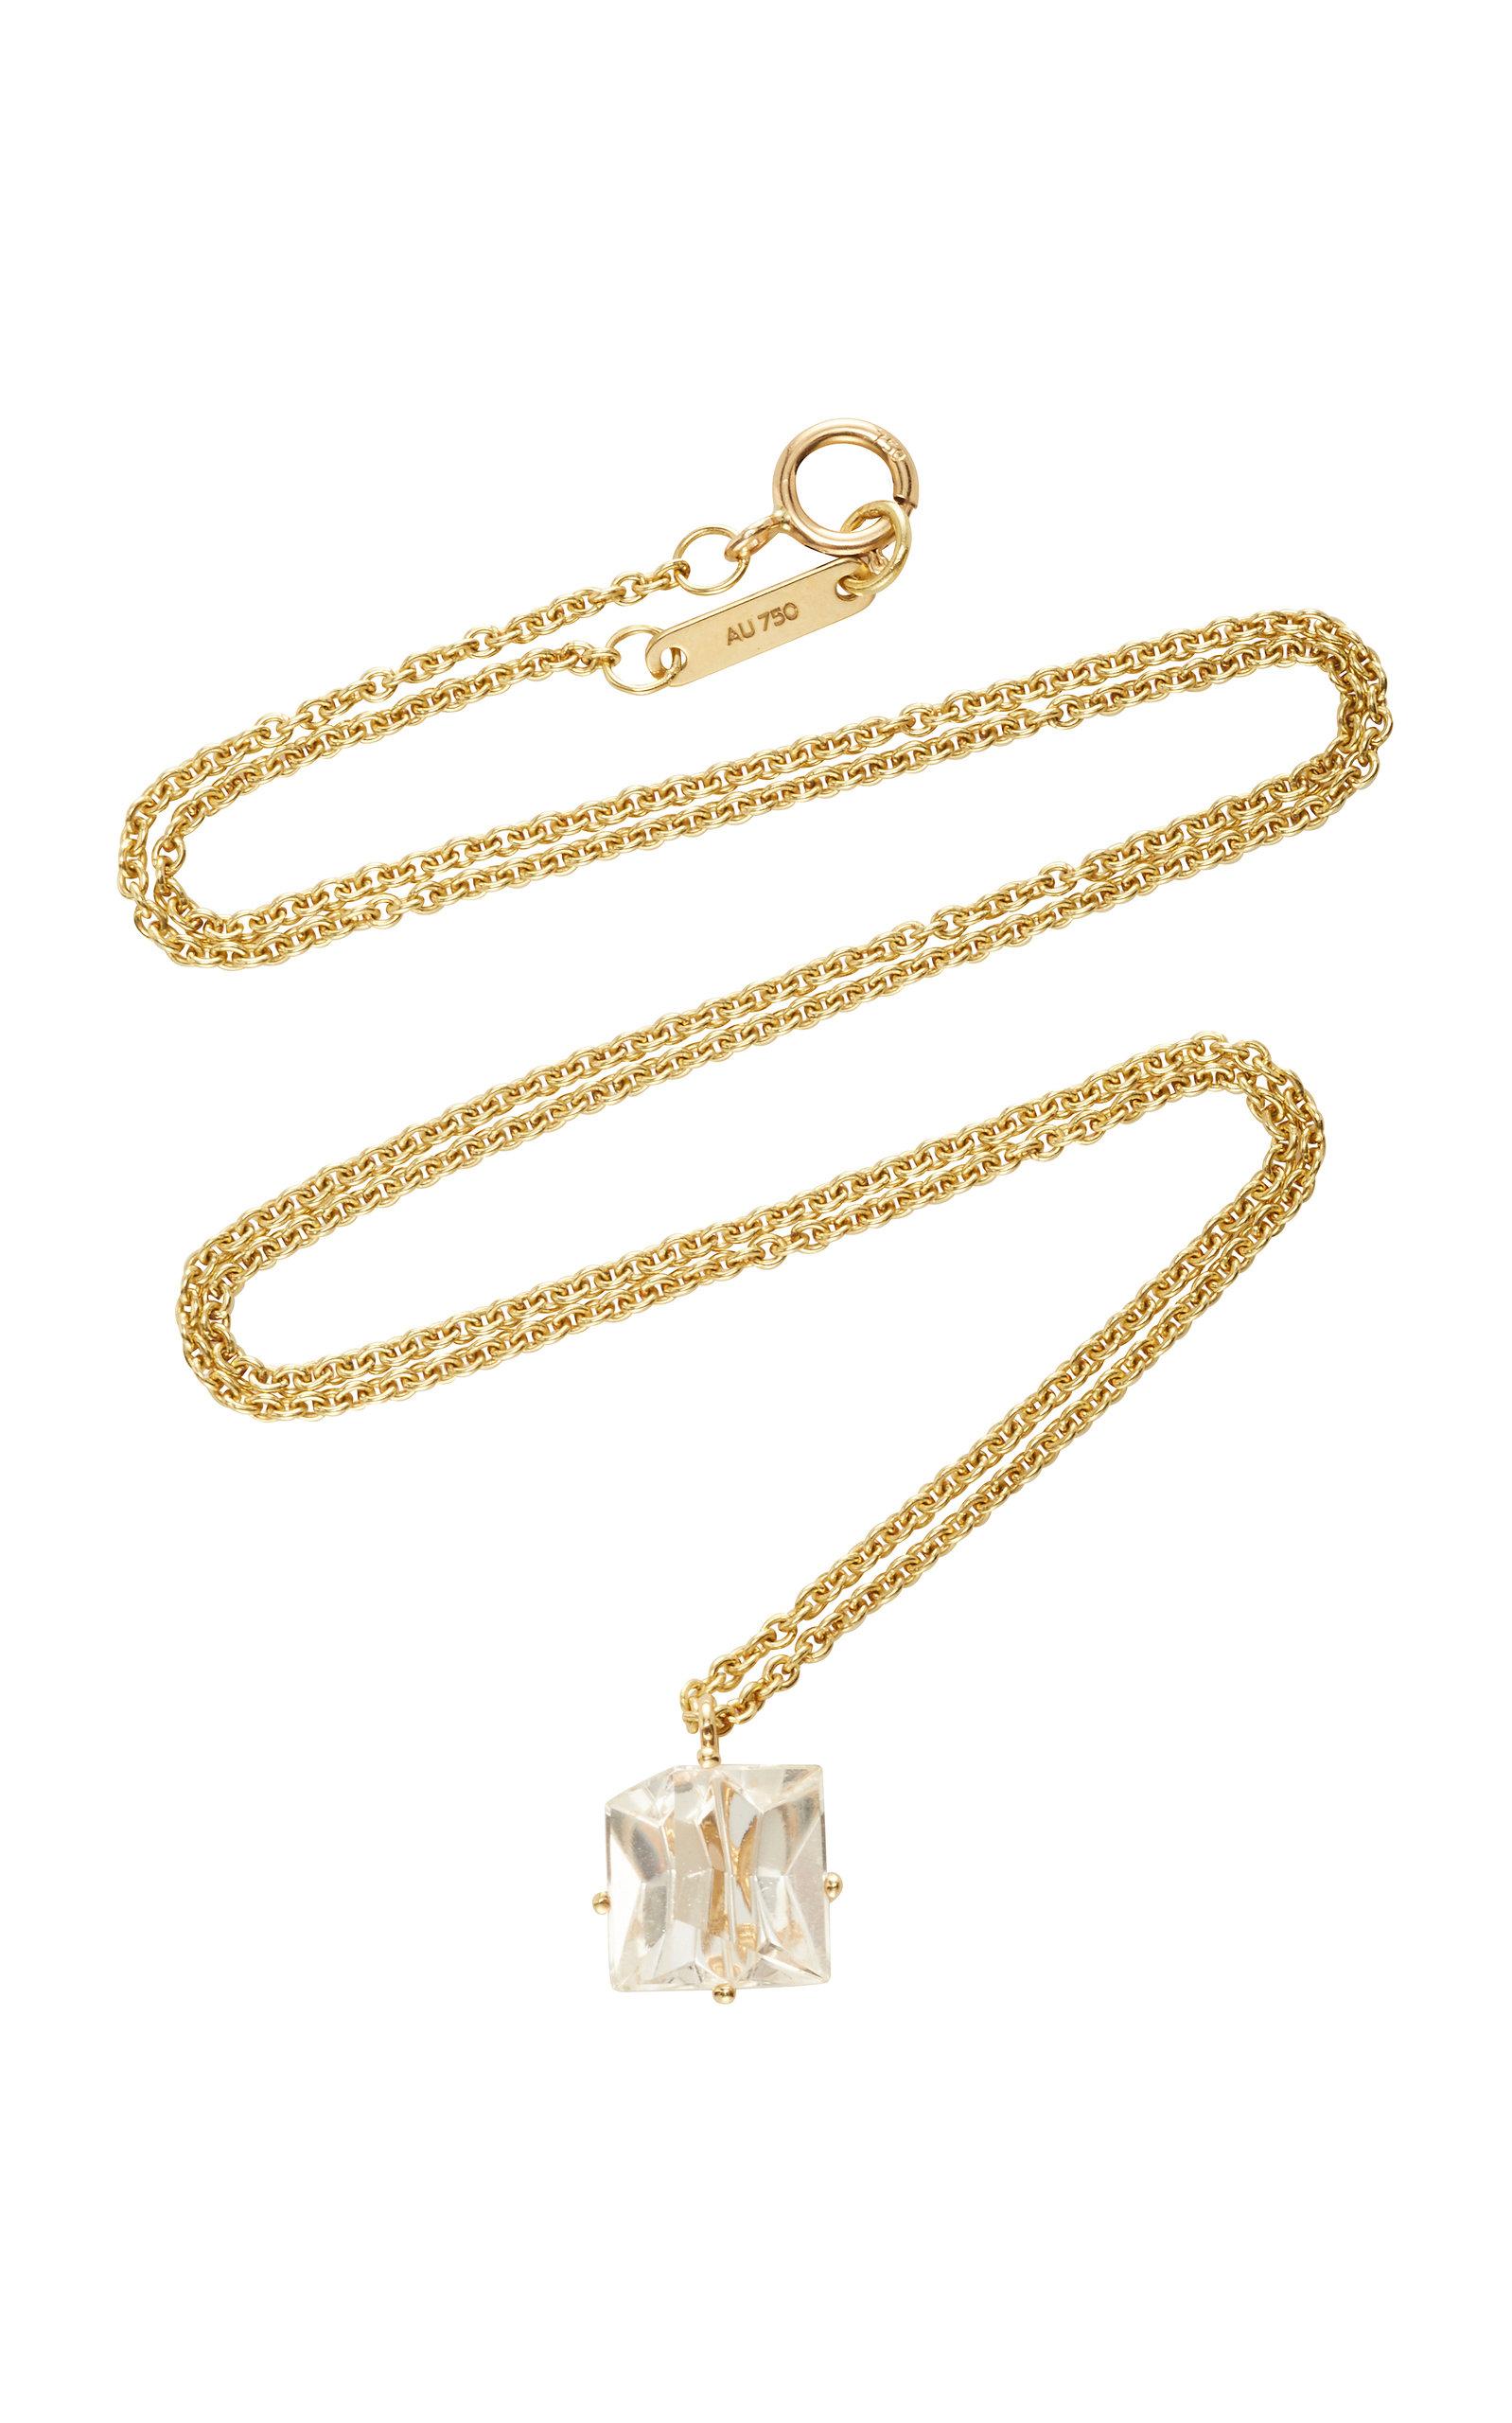 Women's 18K Gold Morganite Necklace